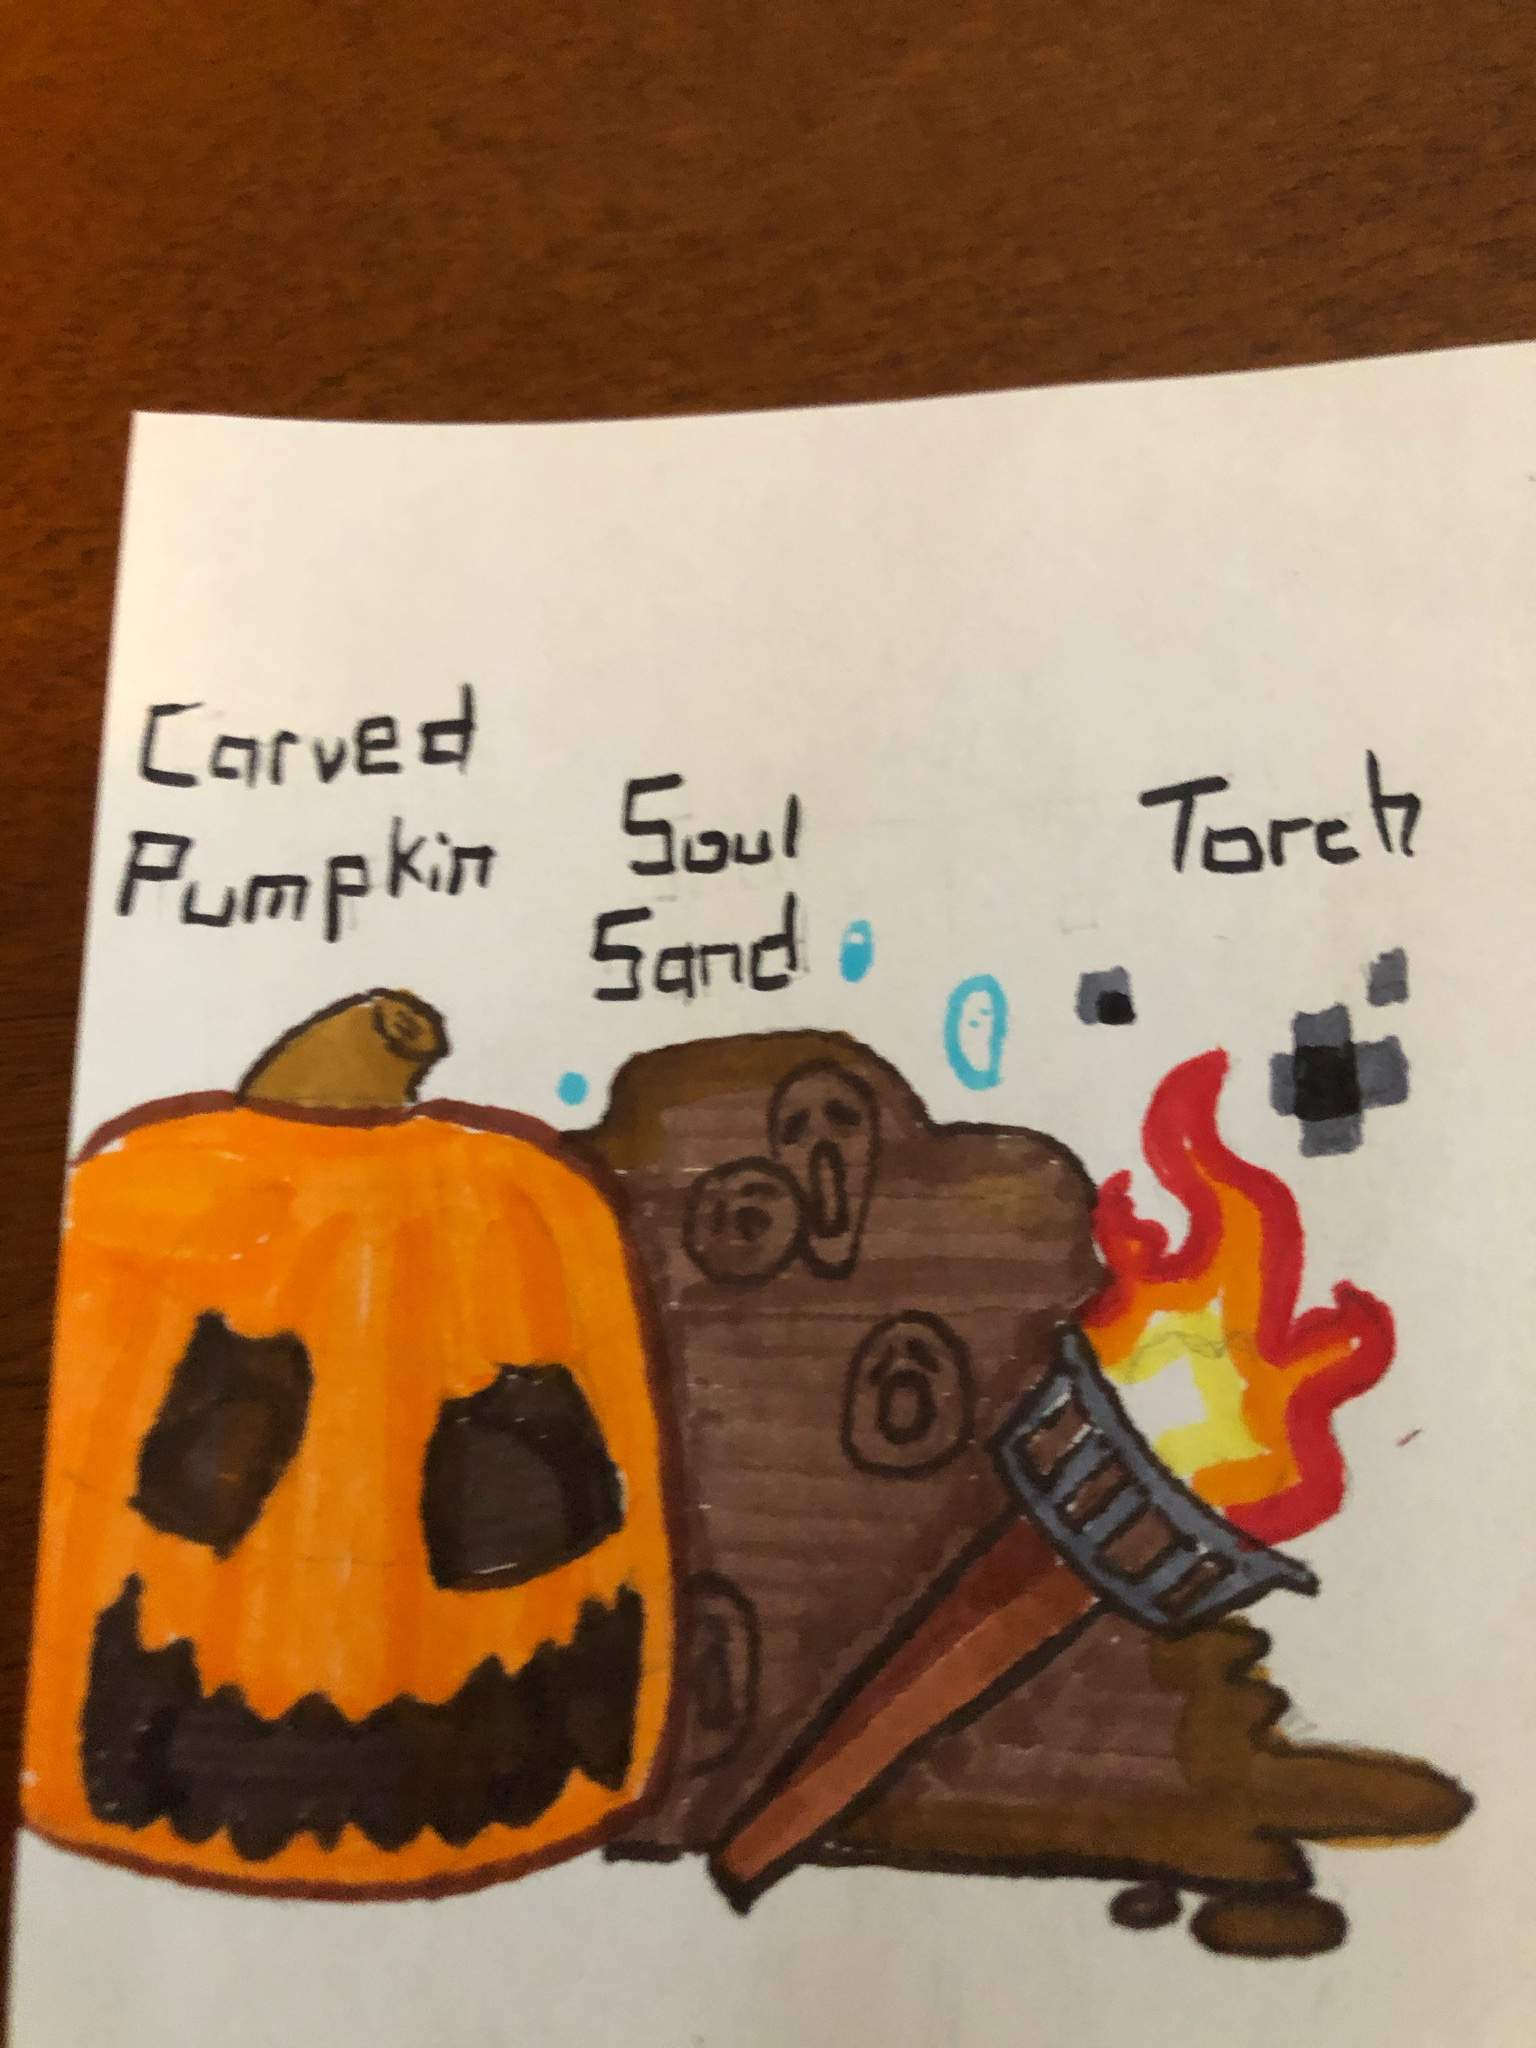 The Soul Jack O Lantern Soulom Minecraft Amino